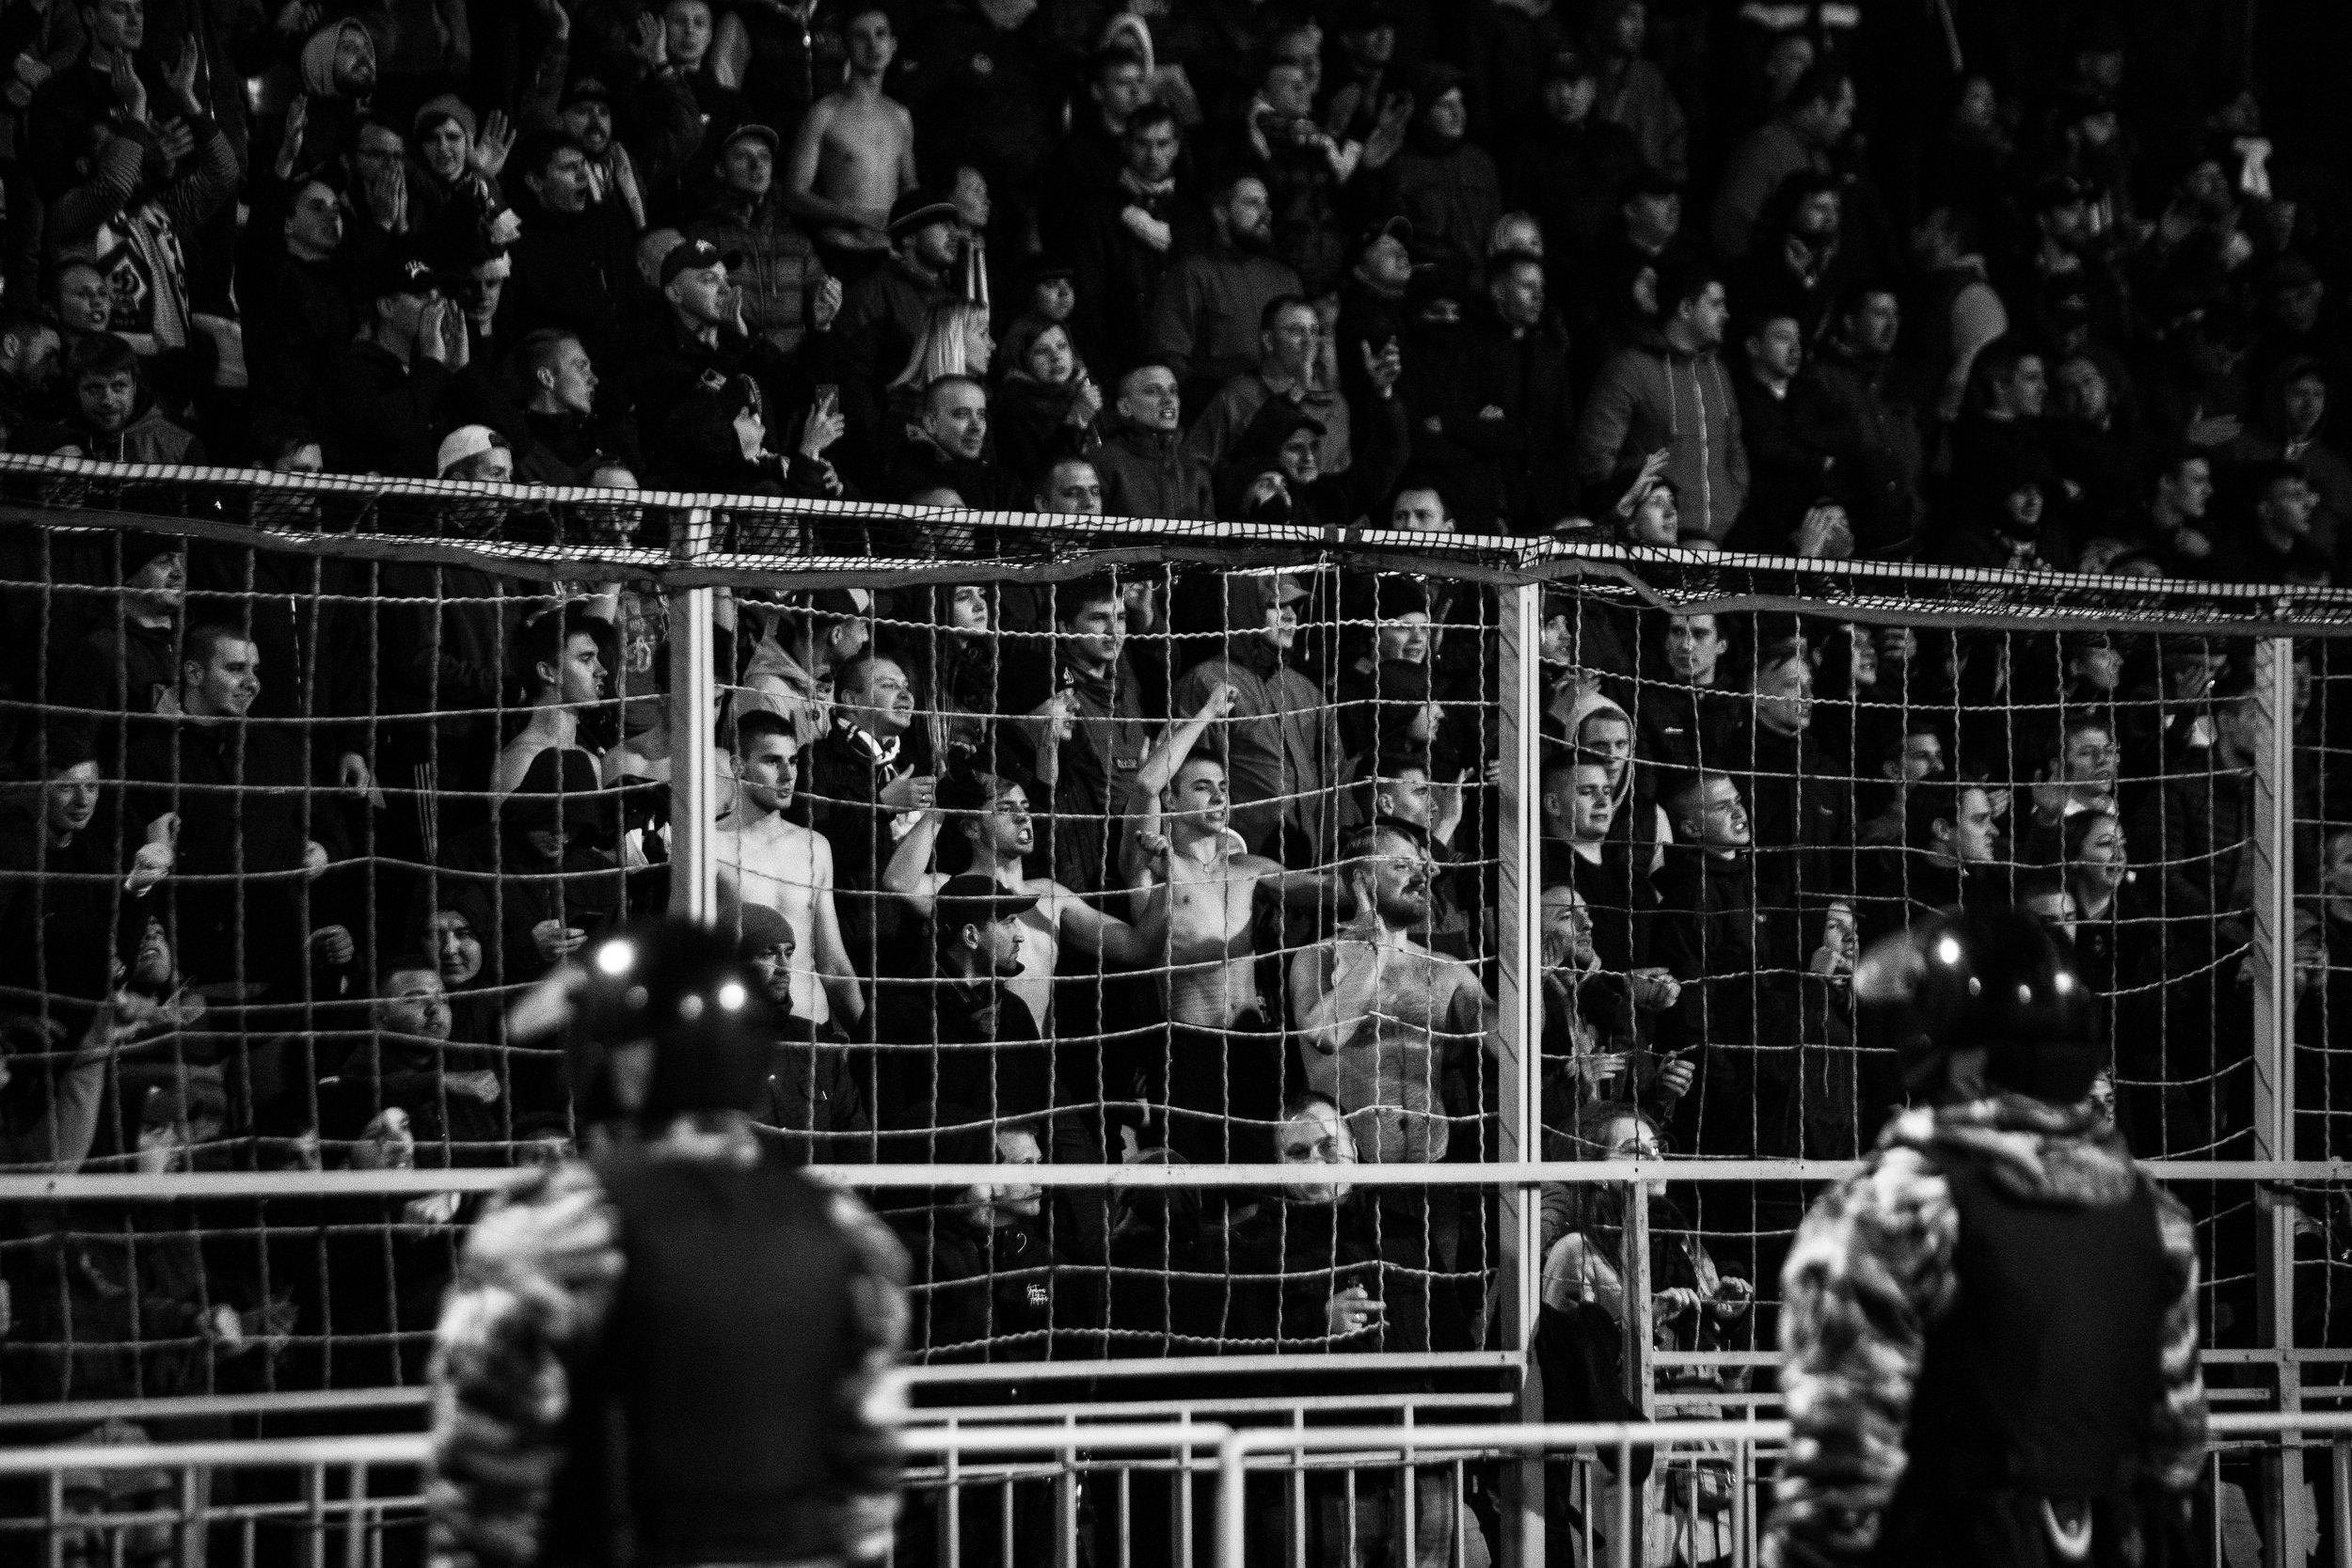 Ball, Smoke and old school Ultras